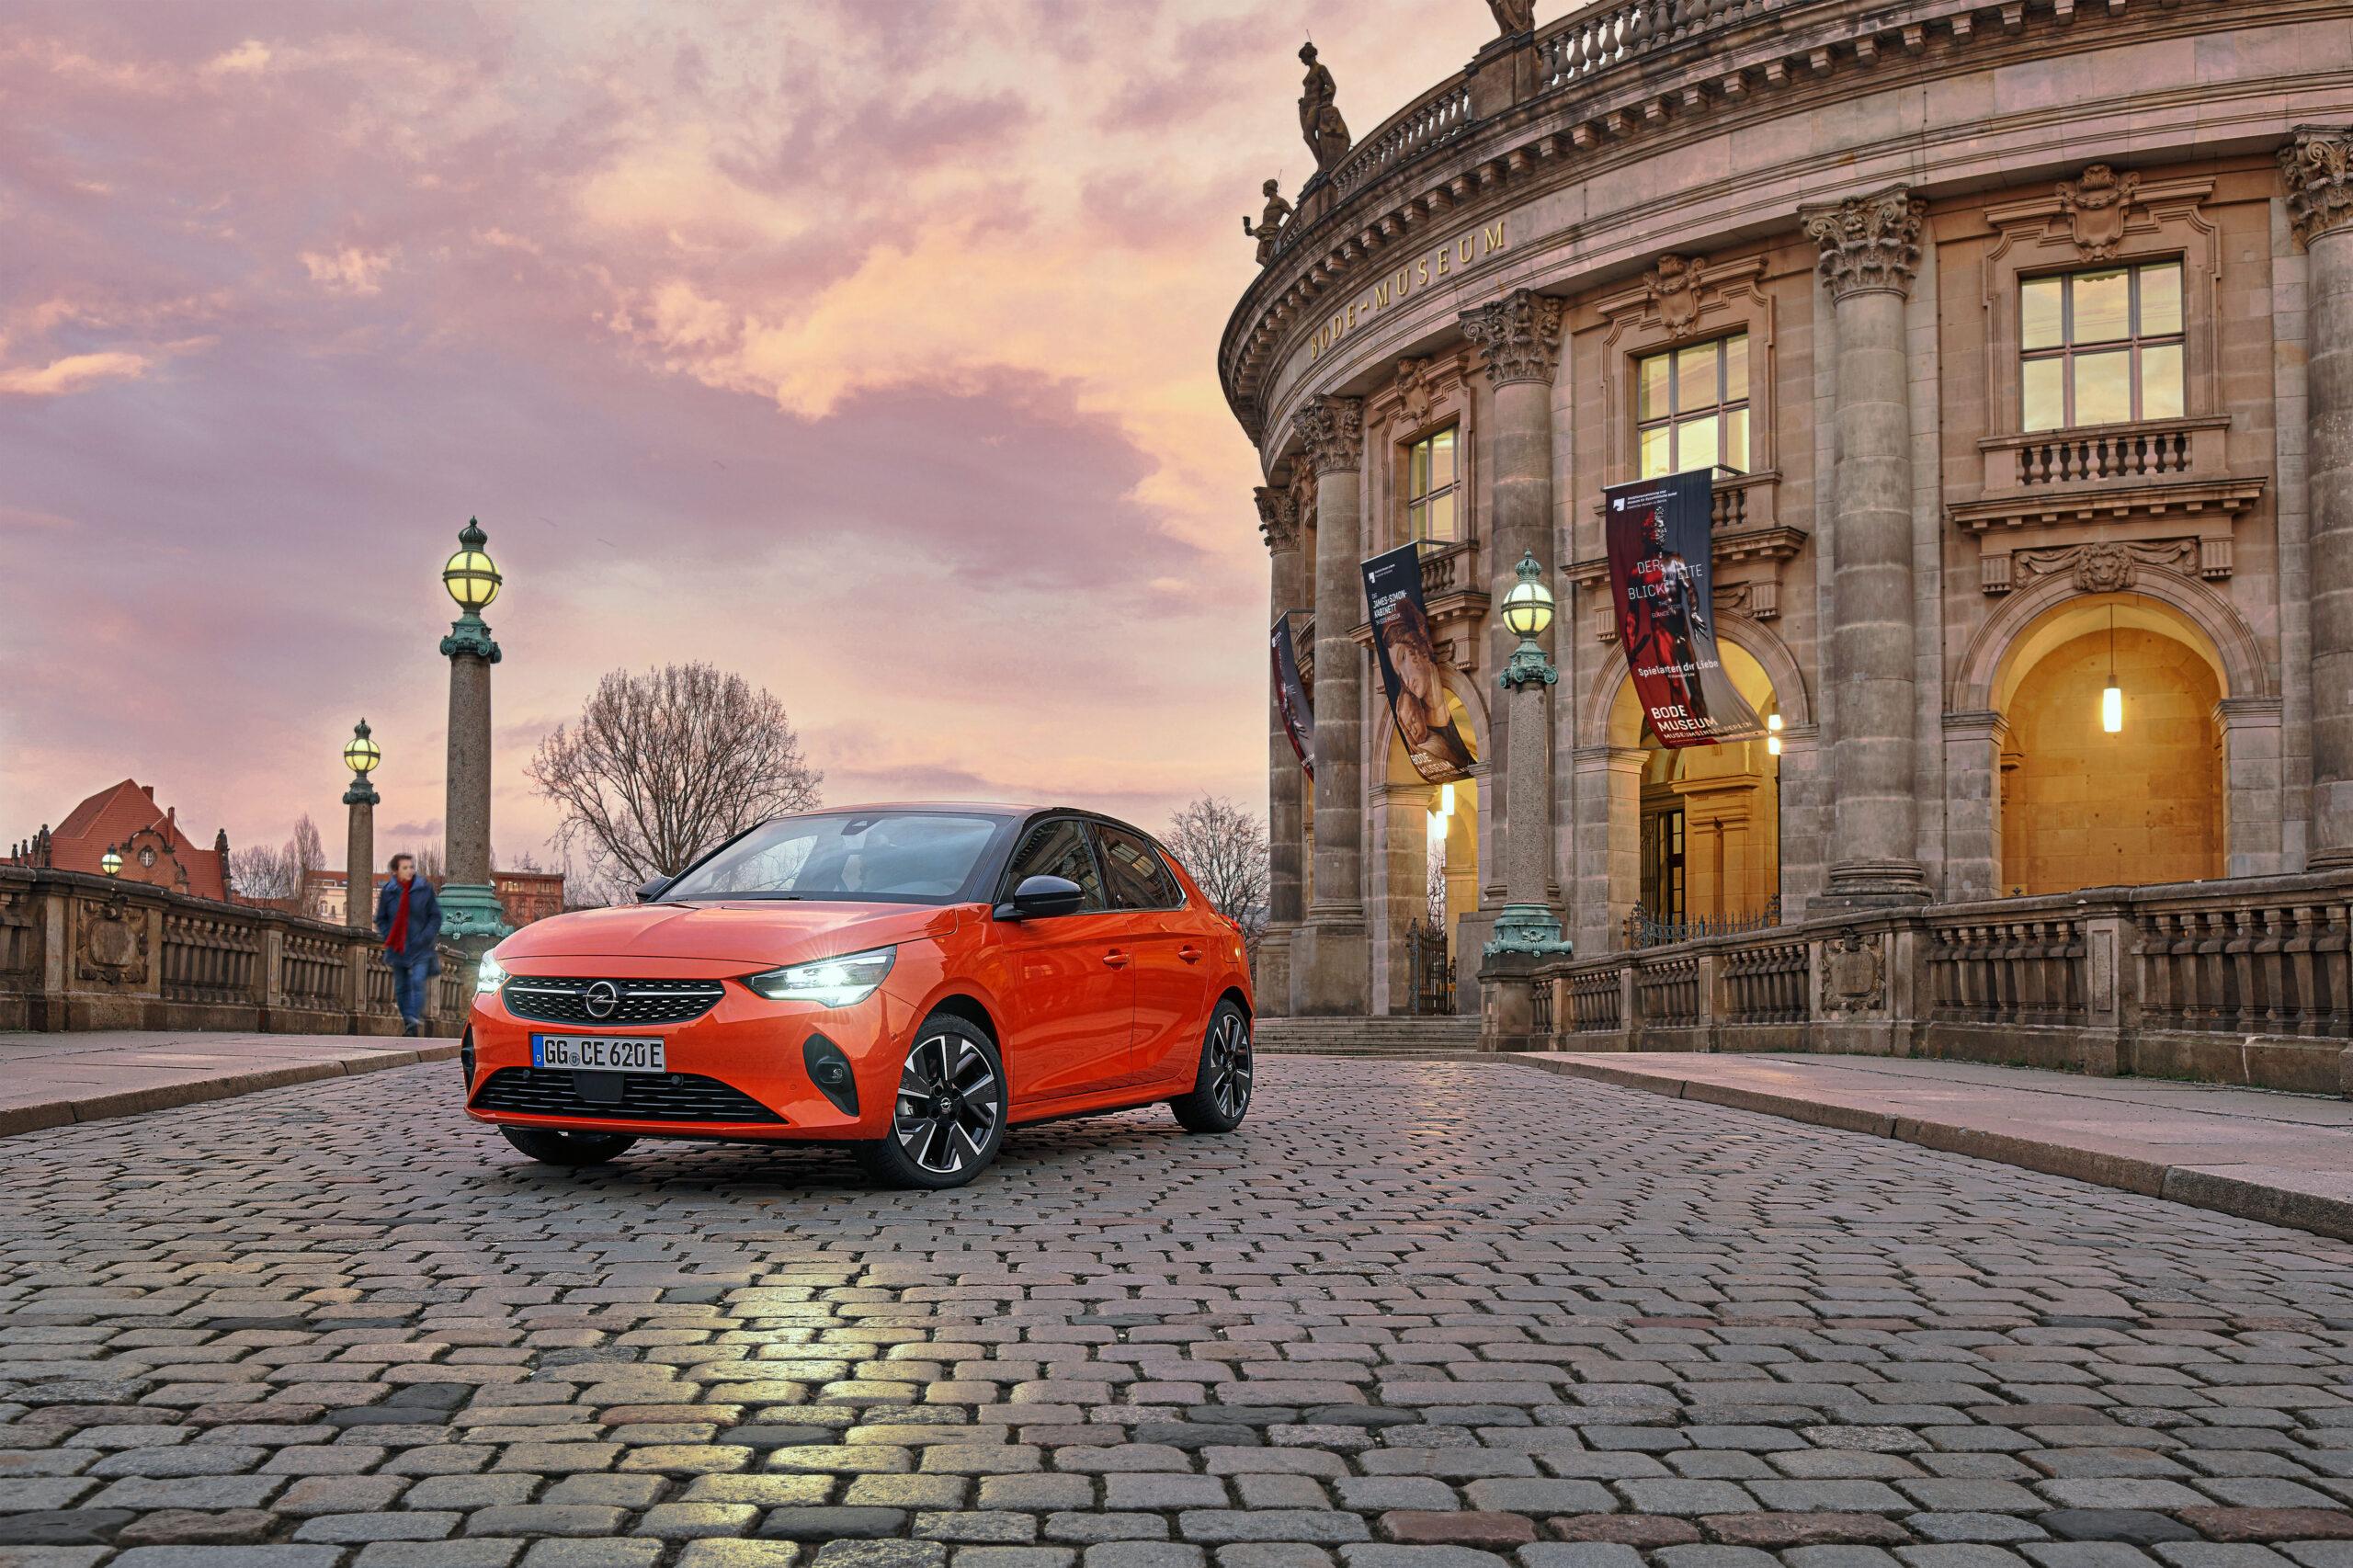 Nouvelle Opel Corsa Garage Guex